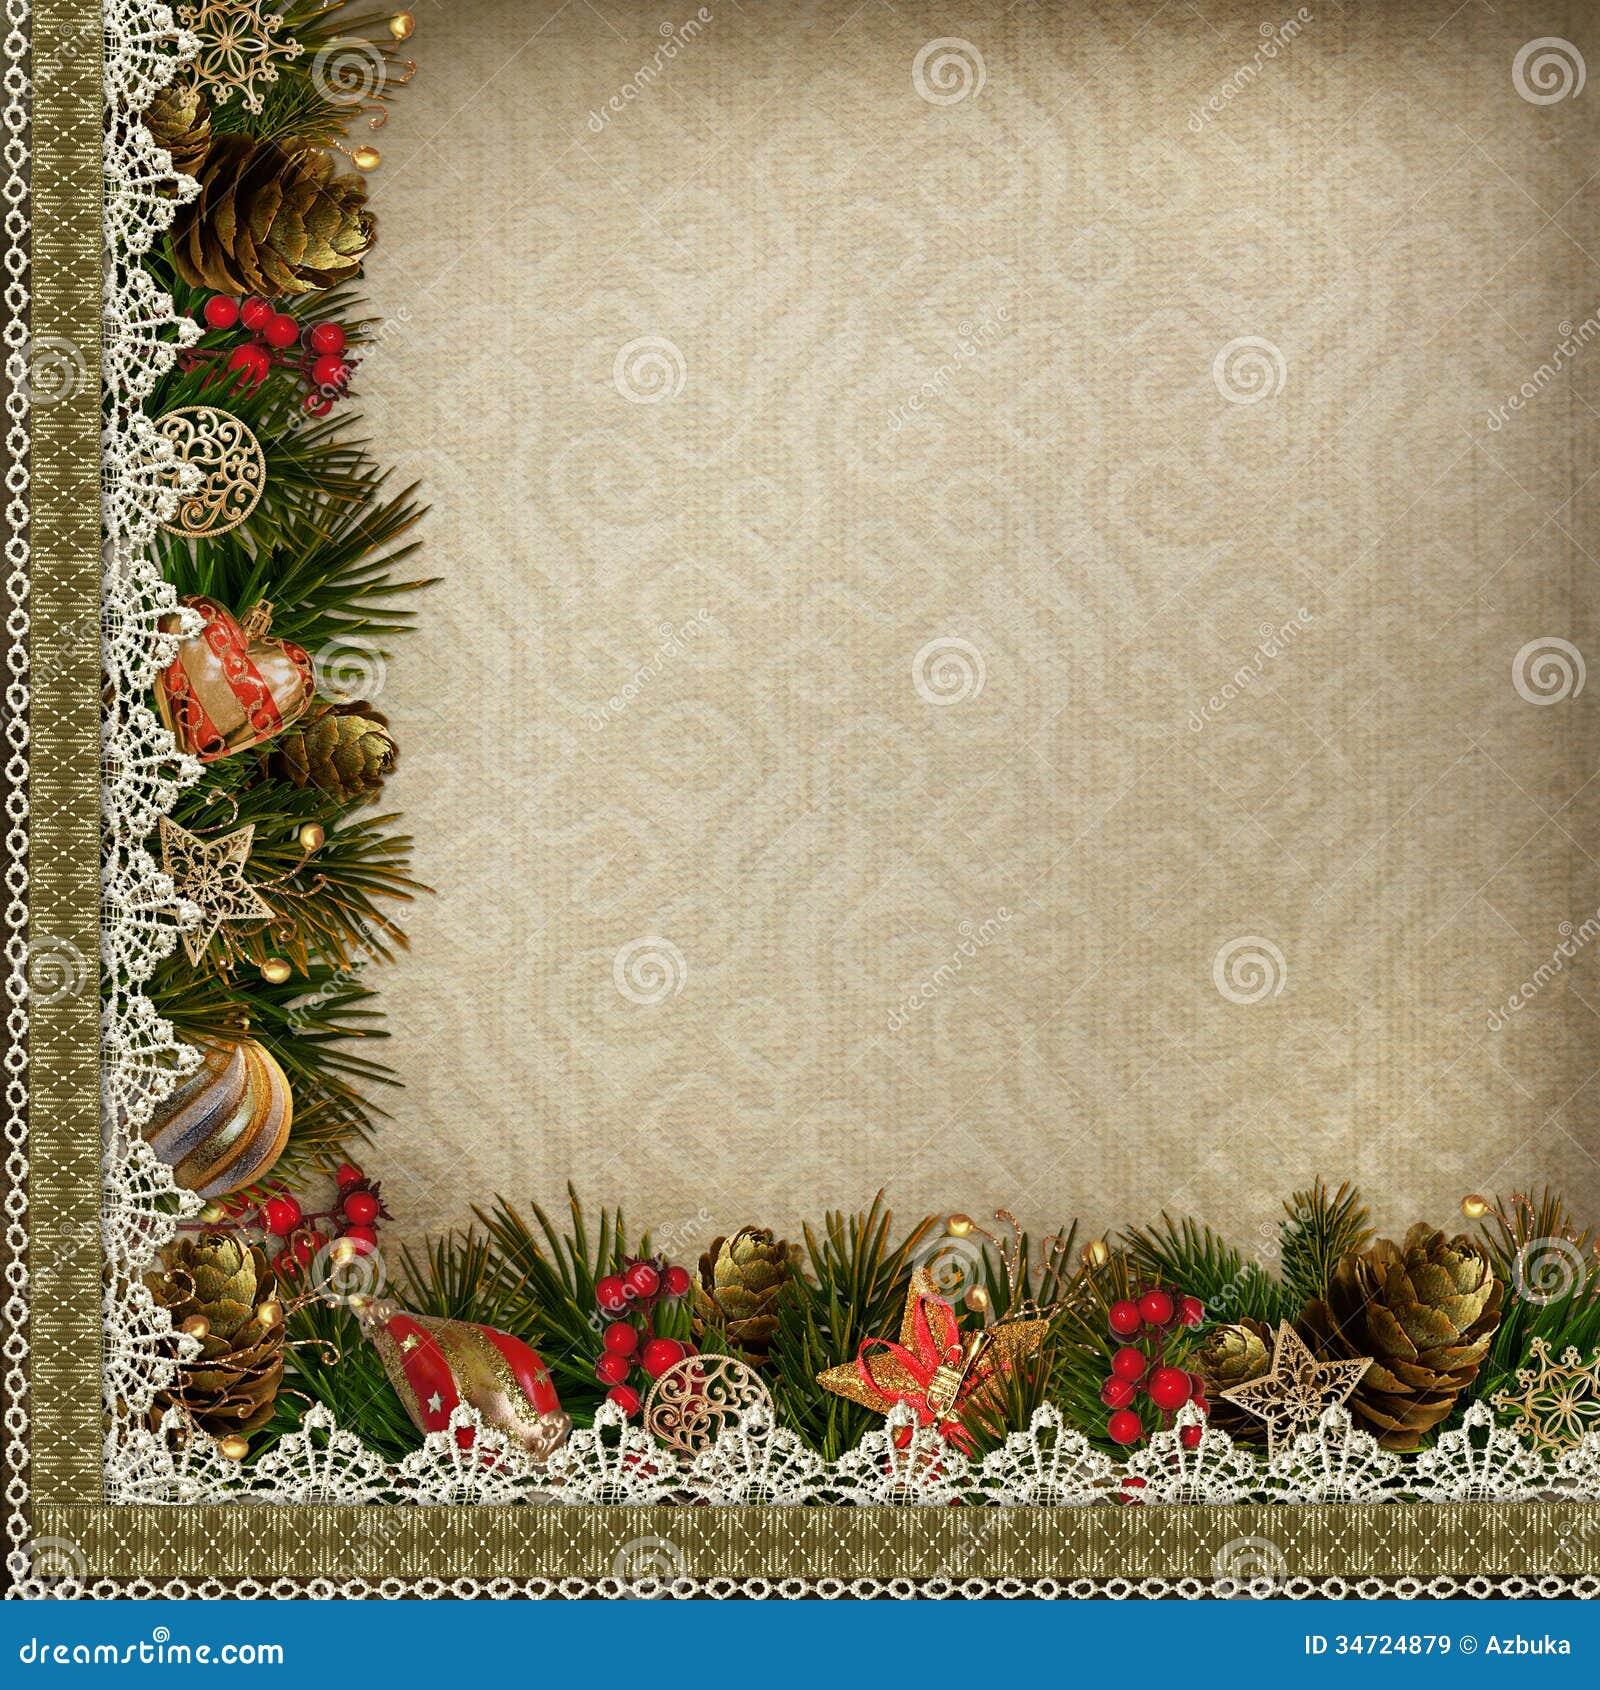 #AD1F1E Borders Of Christmas Decorations With Lace On Vintage  5535 décorations de noel vintage 1300x1390 px @ aertt.com